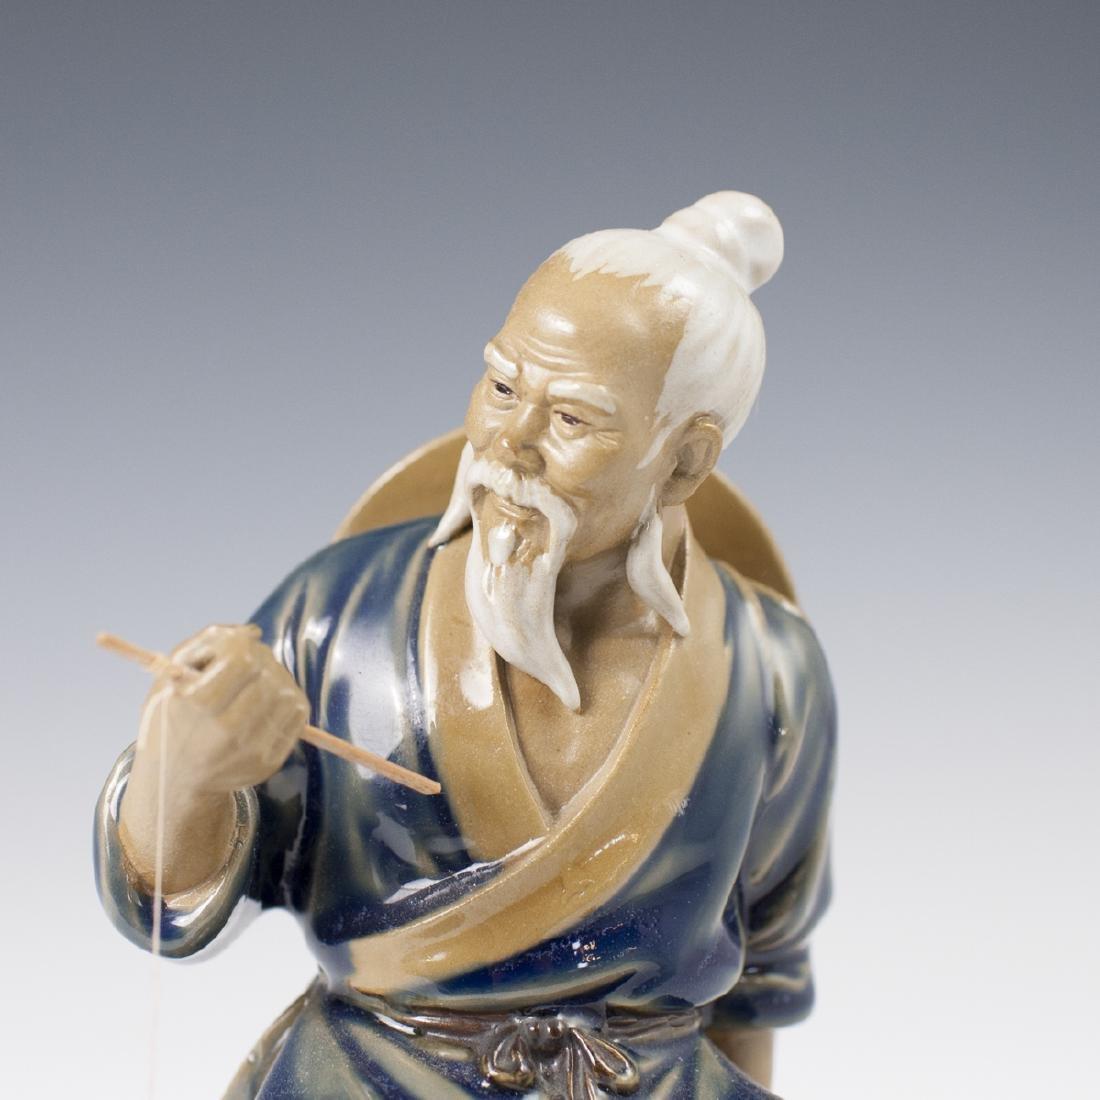 Chinese Glazed Ceramic Mudmen Figurines - 4